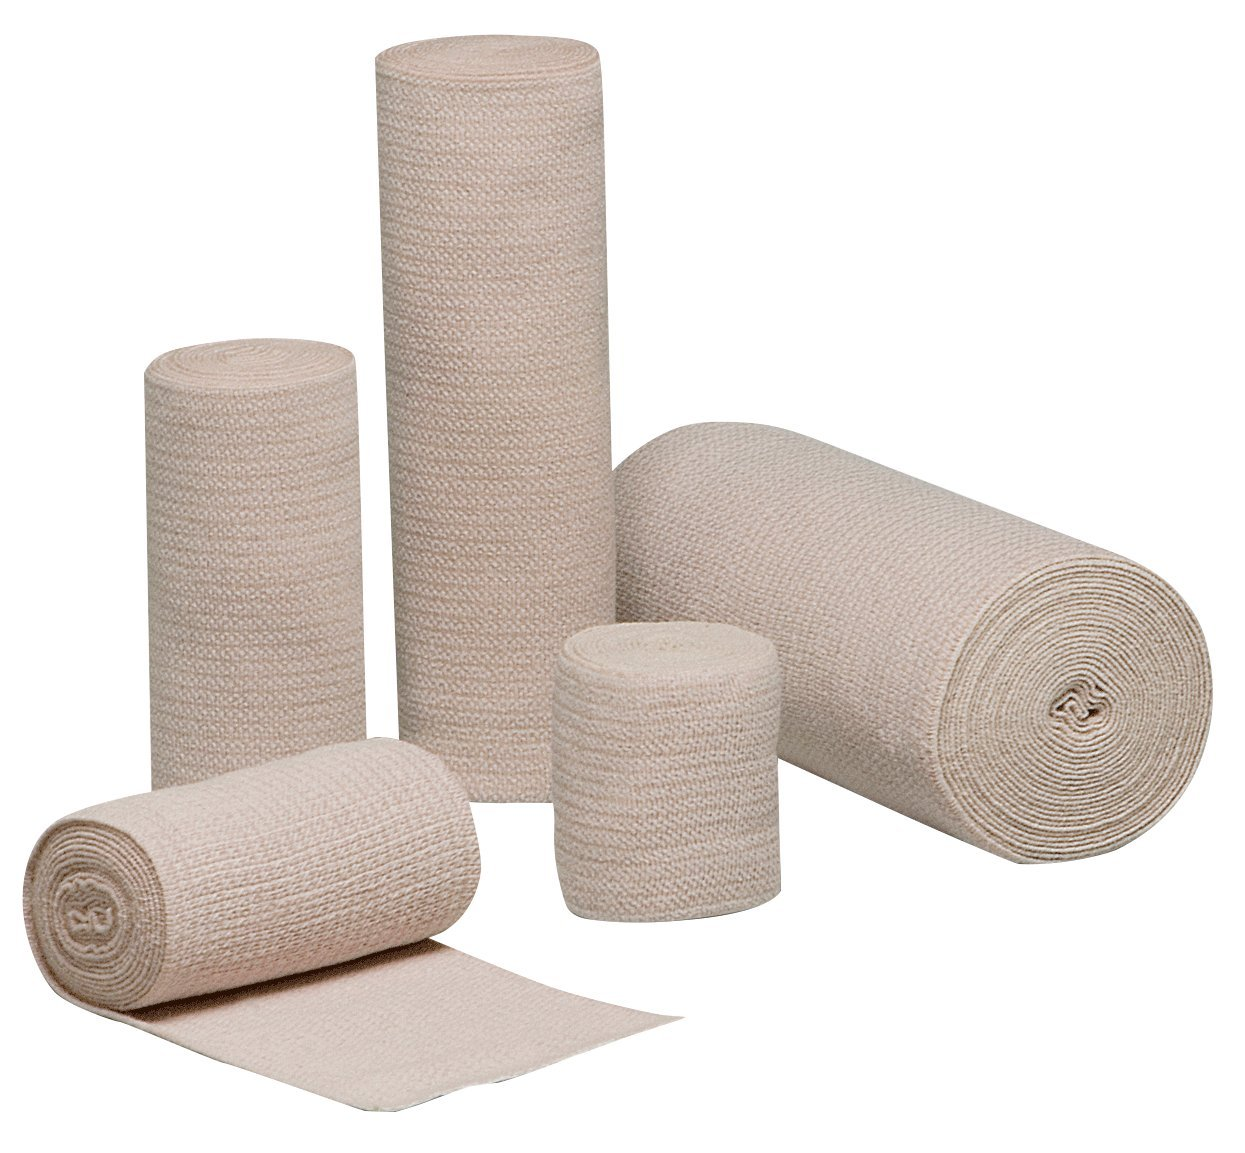 Hartmann 16600000 REB Latex-Free Reinforced Standard Woven Elastic Bandage, 6'' Width, 5 yd. Length (Pack of 10)